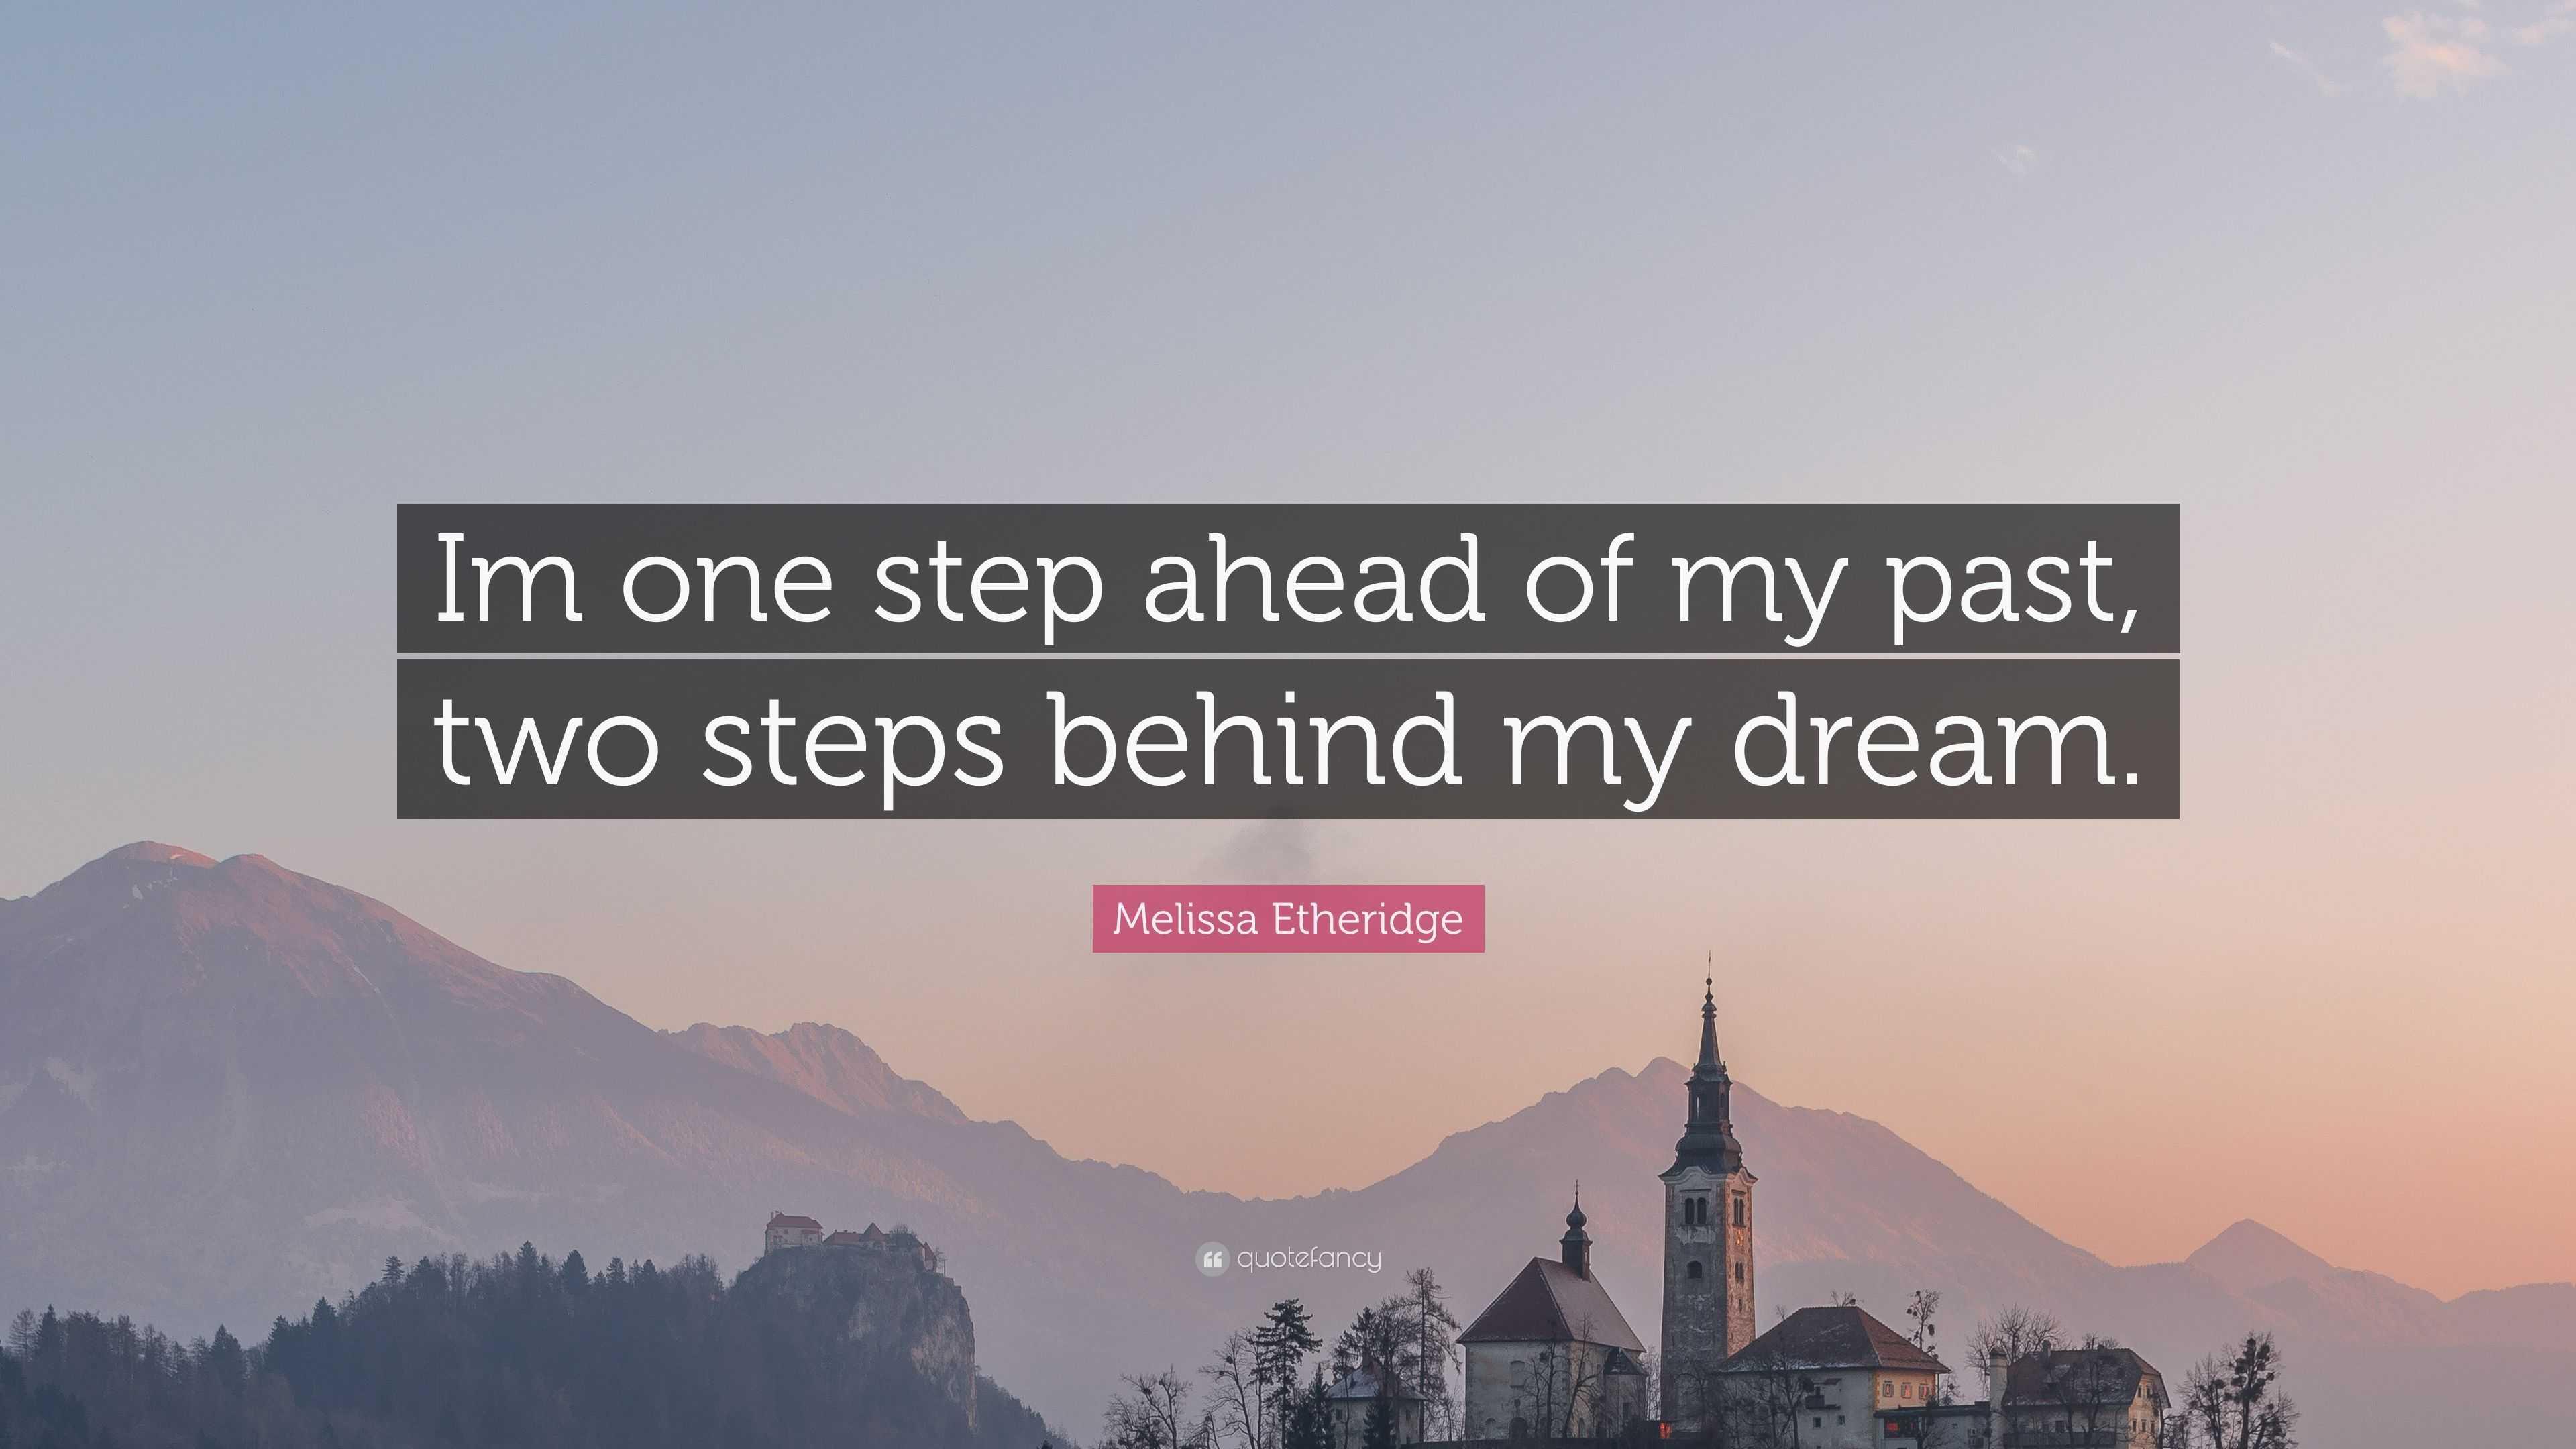 Melissa Etheridge Quote: U201cIm One Step Ahead Of My Past, Two Steps Behind